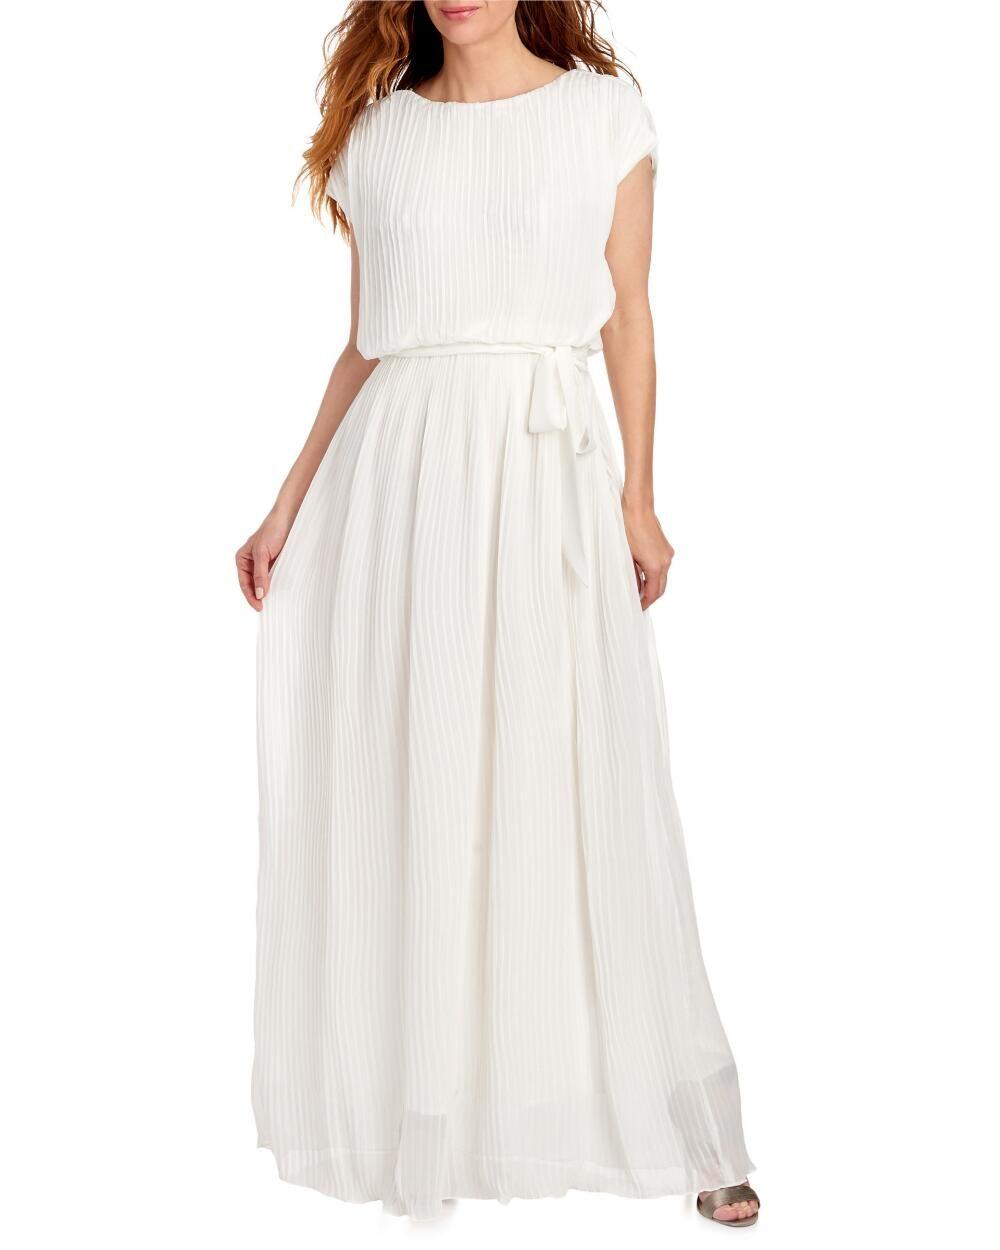 Pleated Chiffon Maxi Dress-Maxi Dresses-Shop by Occasion-Dresses